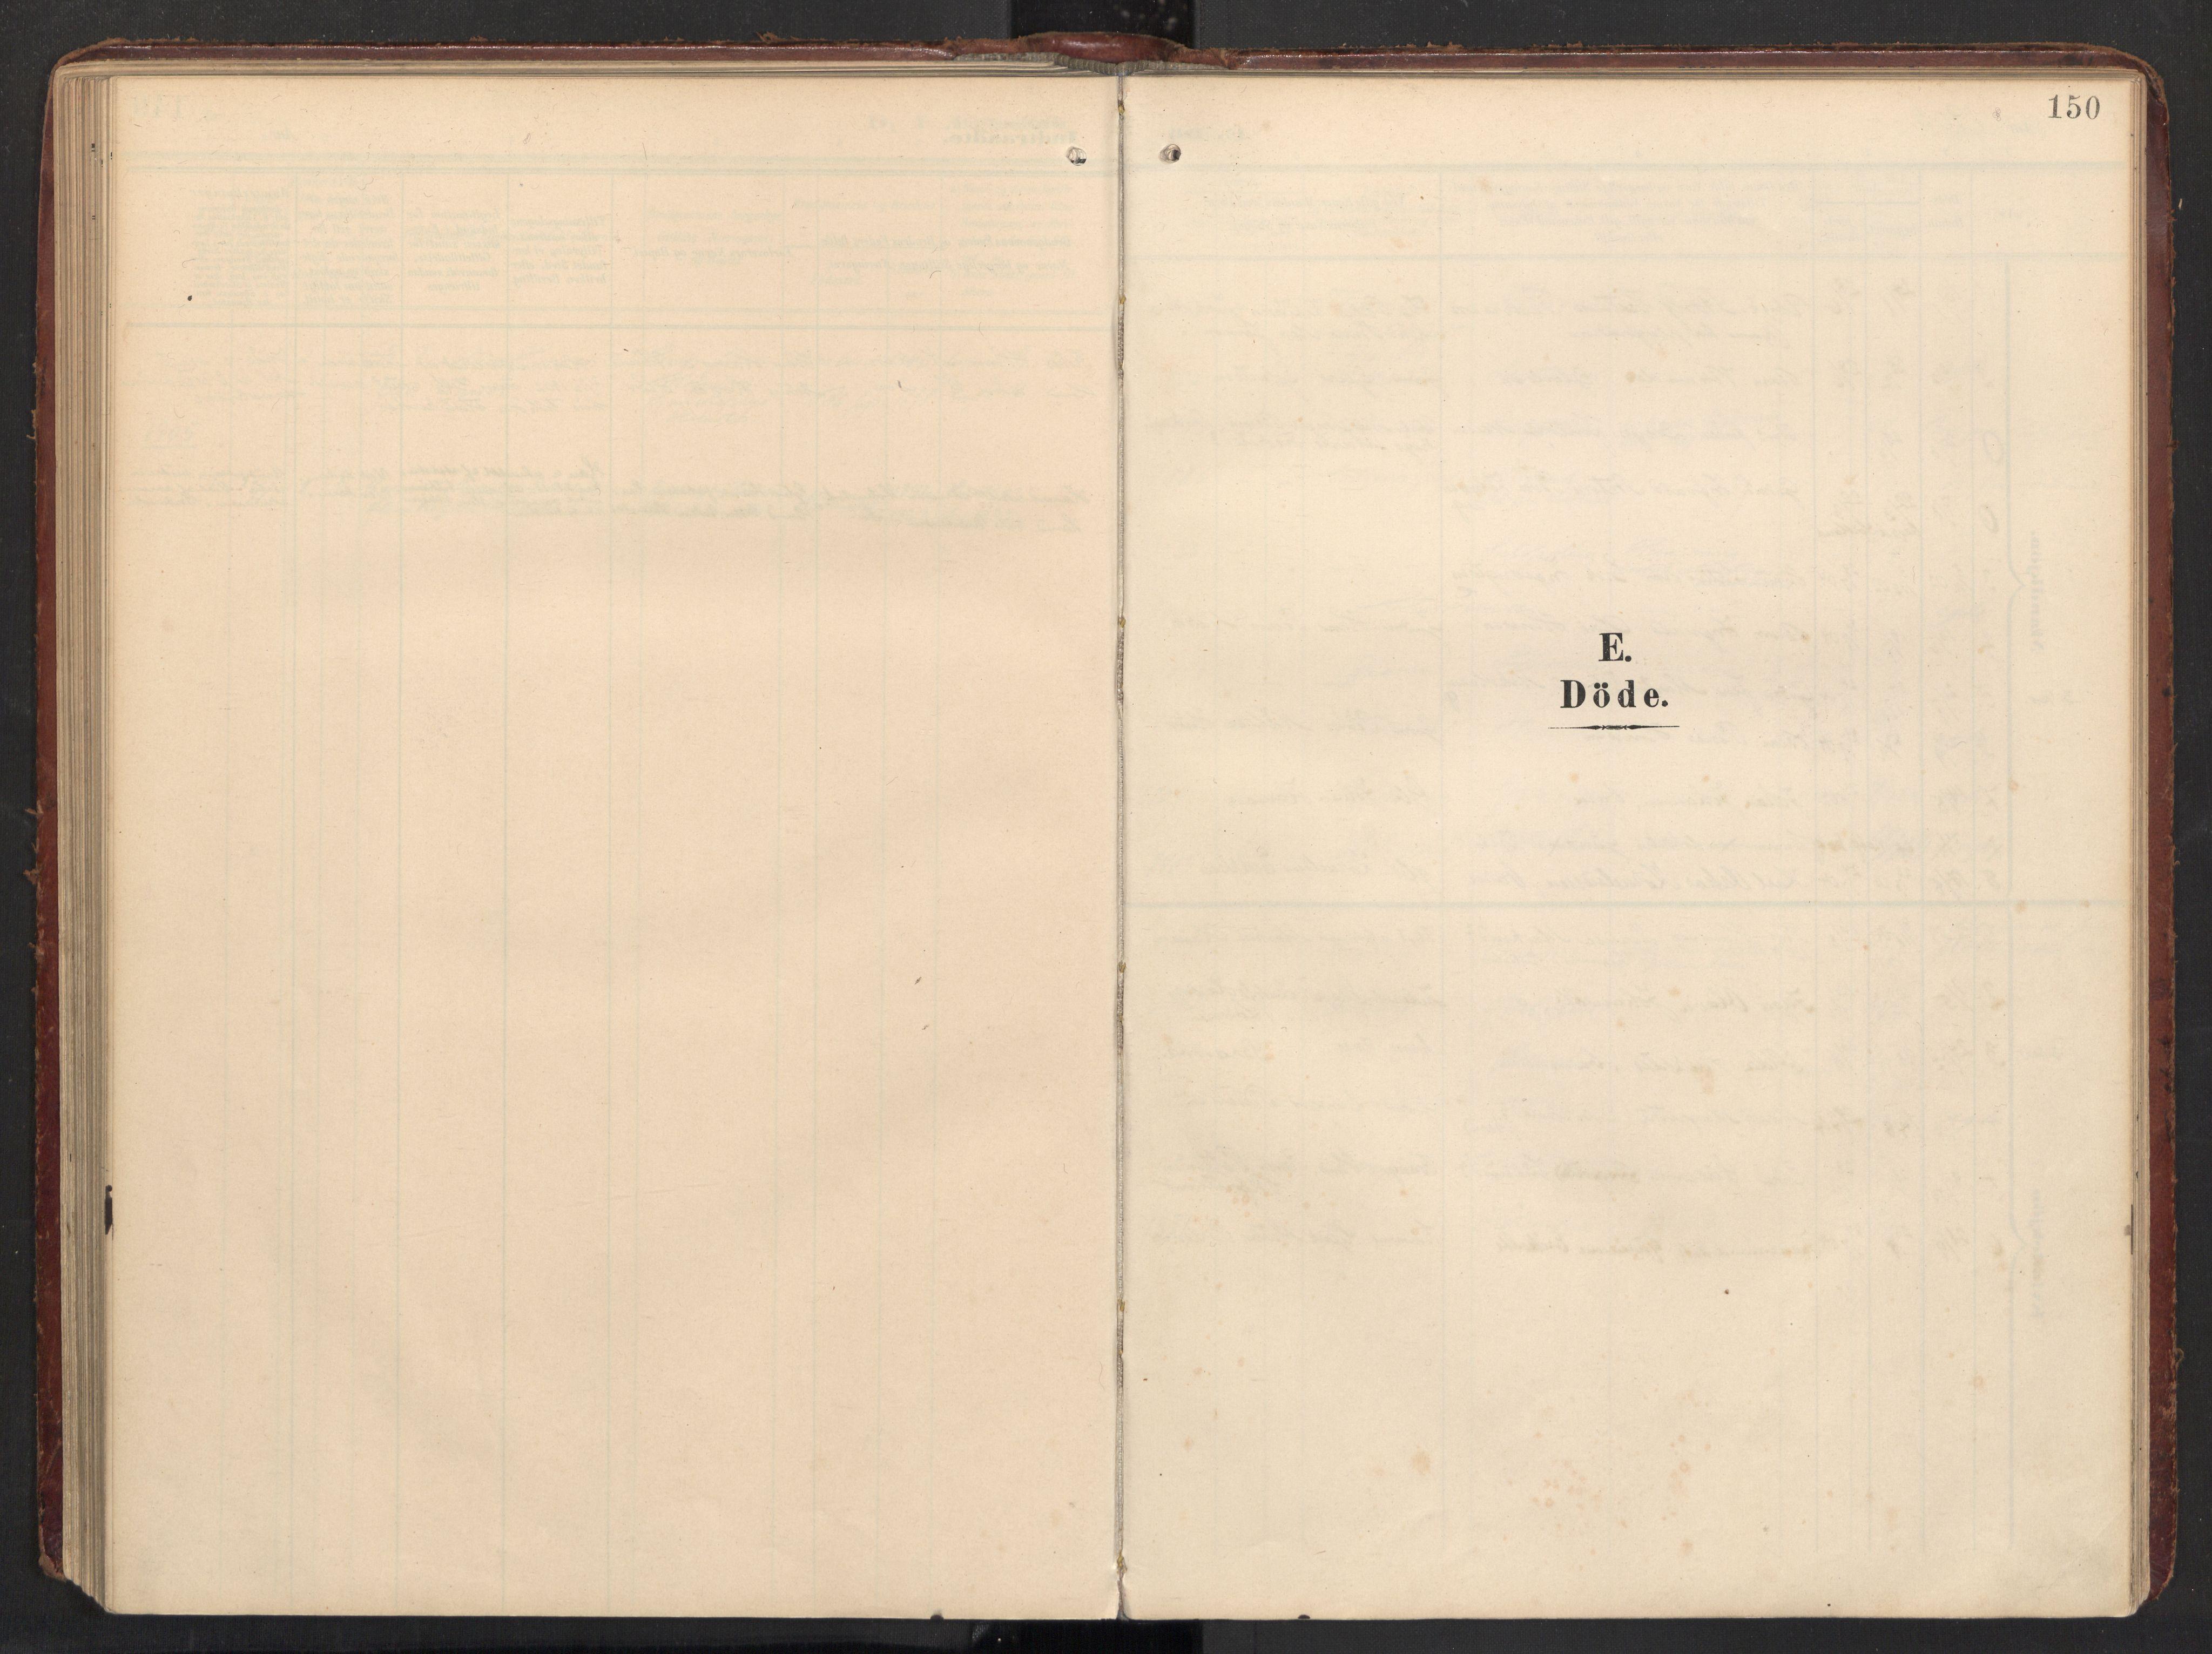 SAT, Ministerialprotokoller, klokkerbøker og fødselsregistre - Nordland, 890/L1287: Ministerialbok nr. 890A02, 1903-1915, s. 150